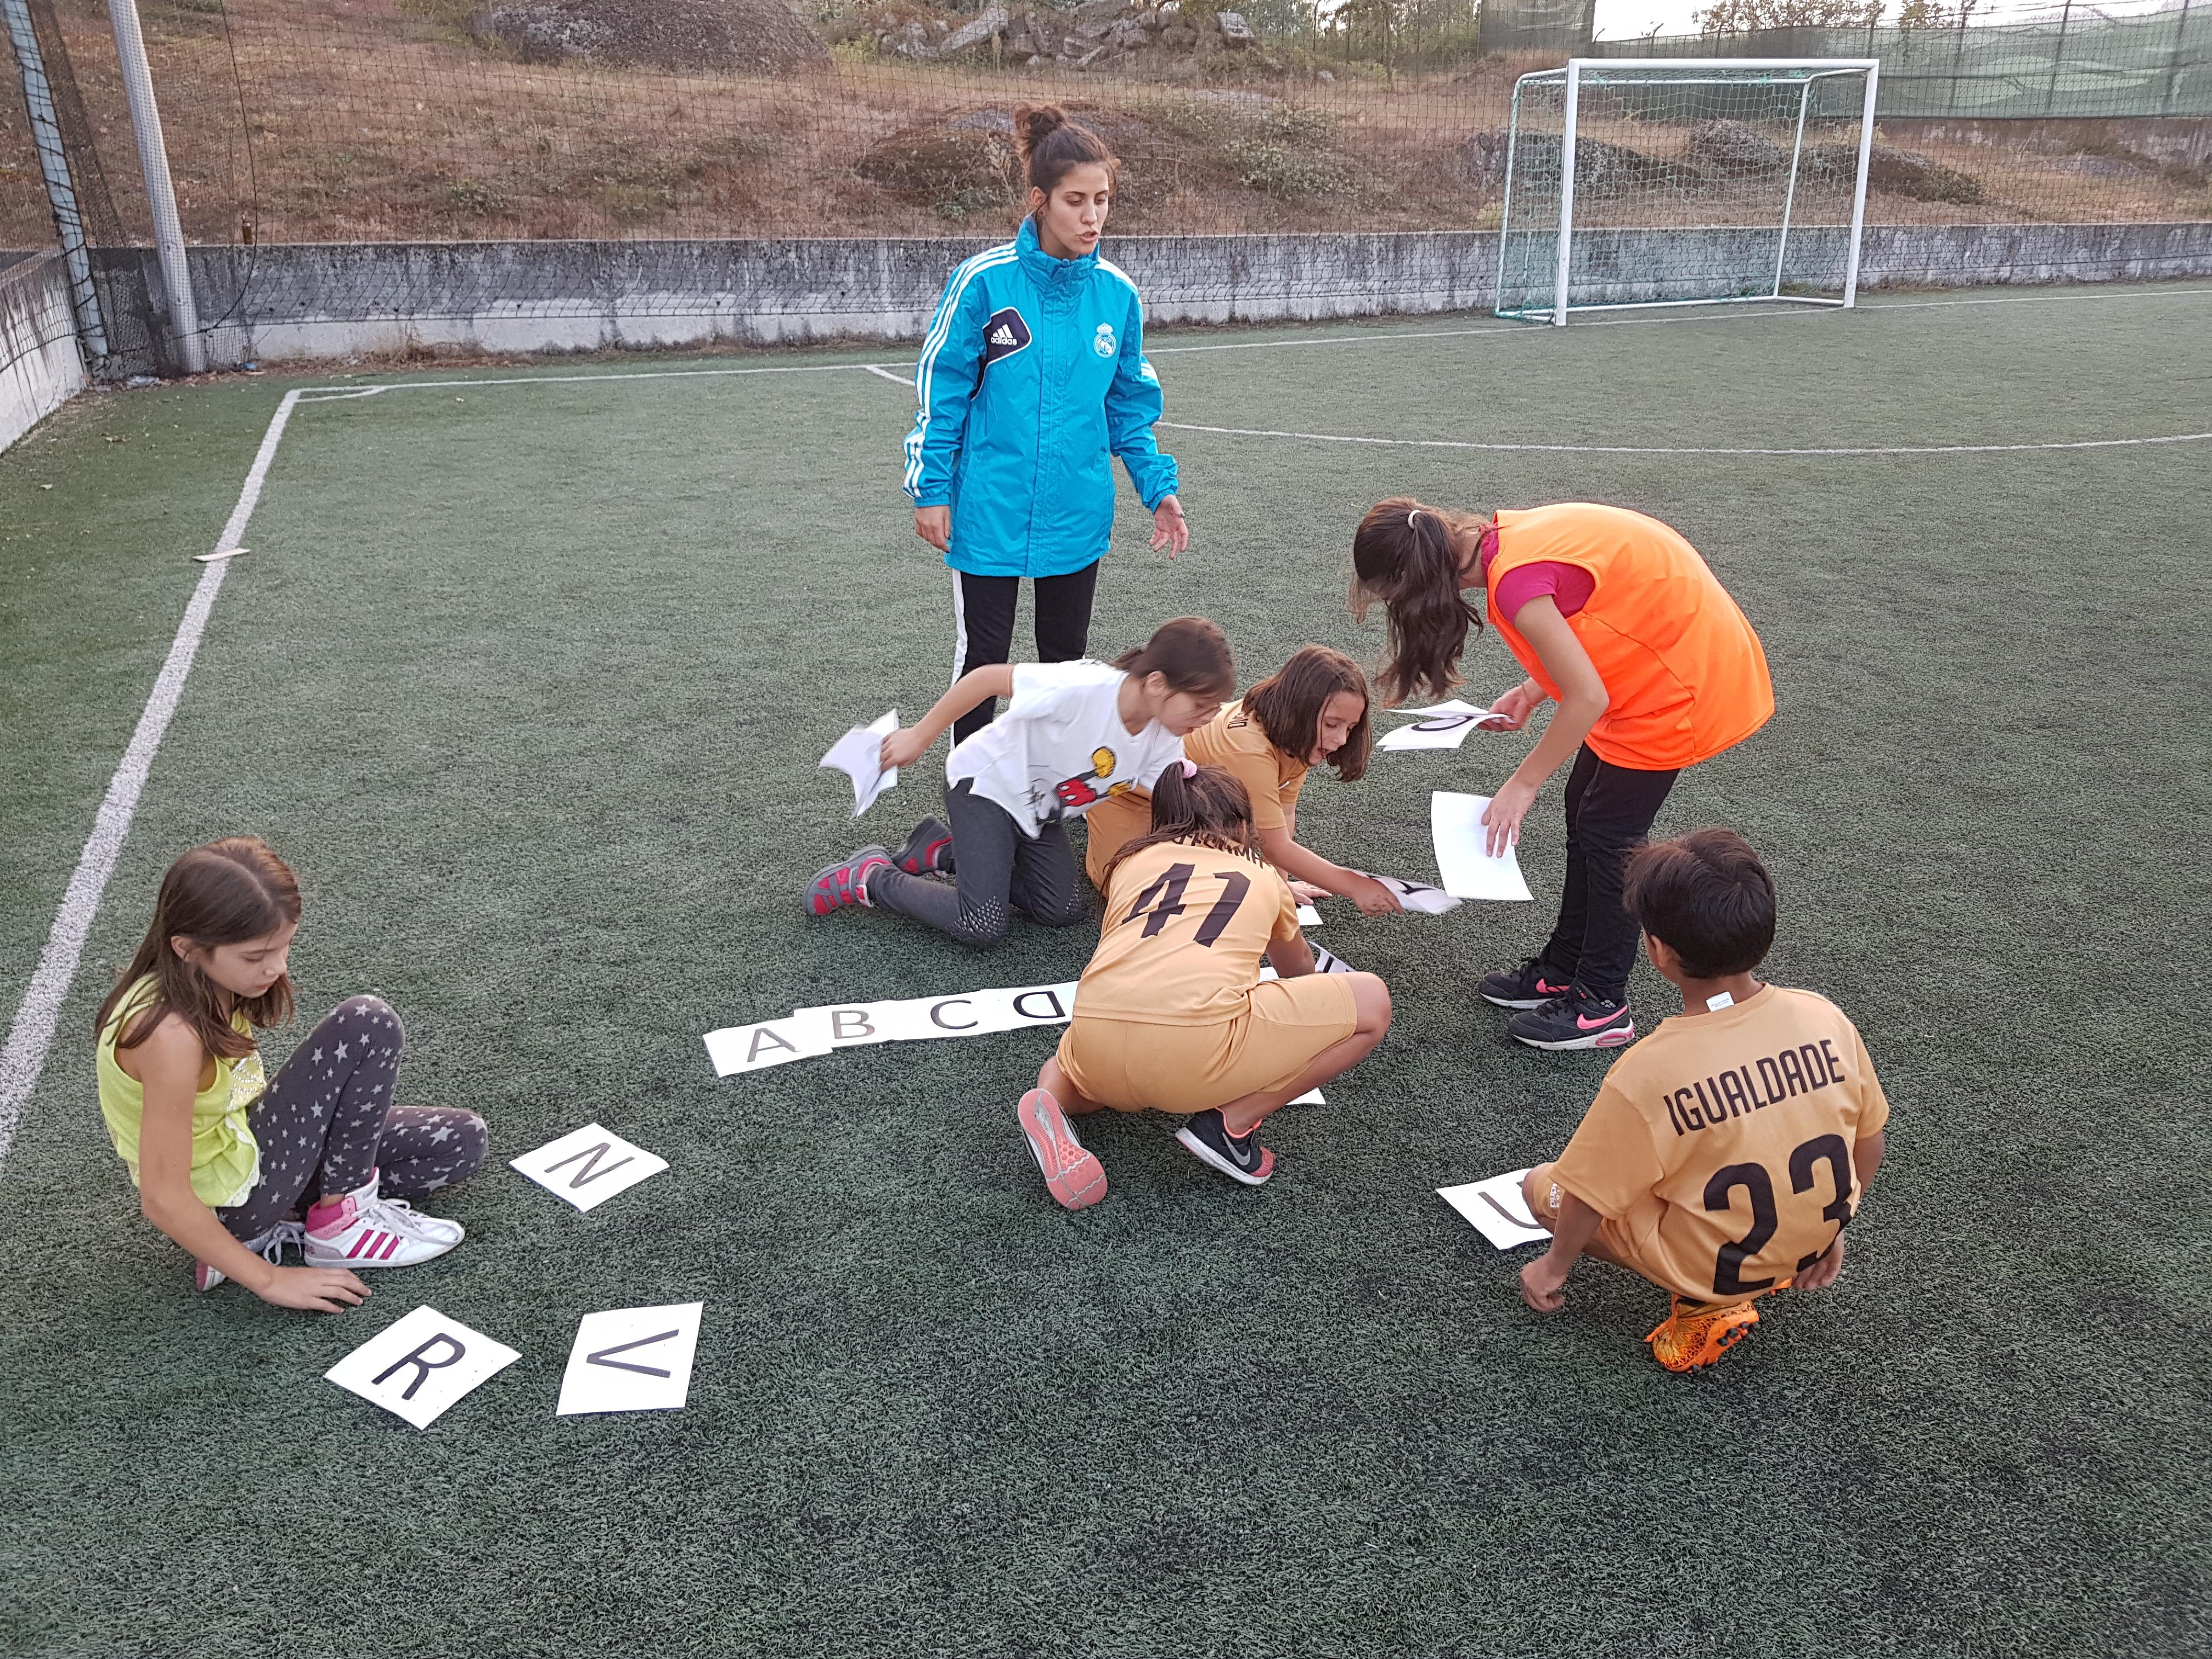 Real Madrid - Social sports school in Guimaraes- educative activity